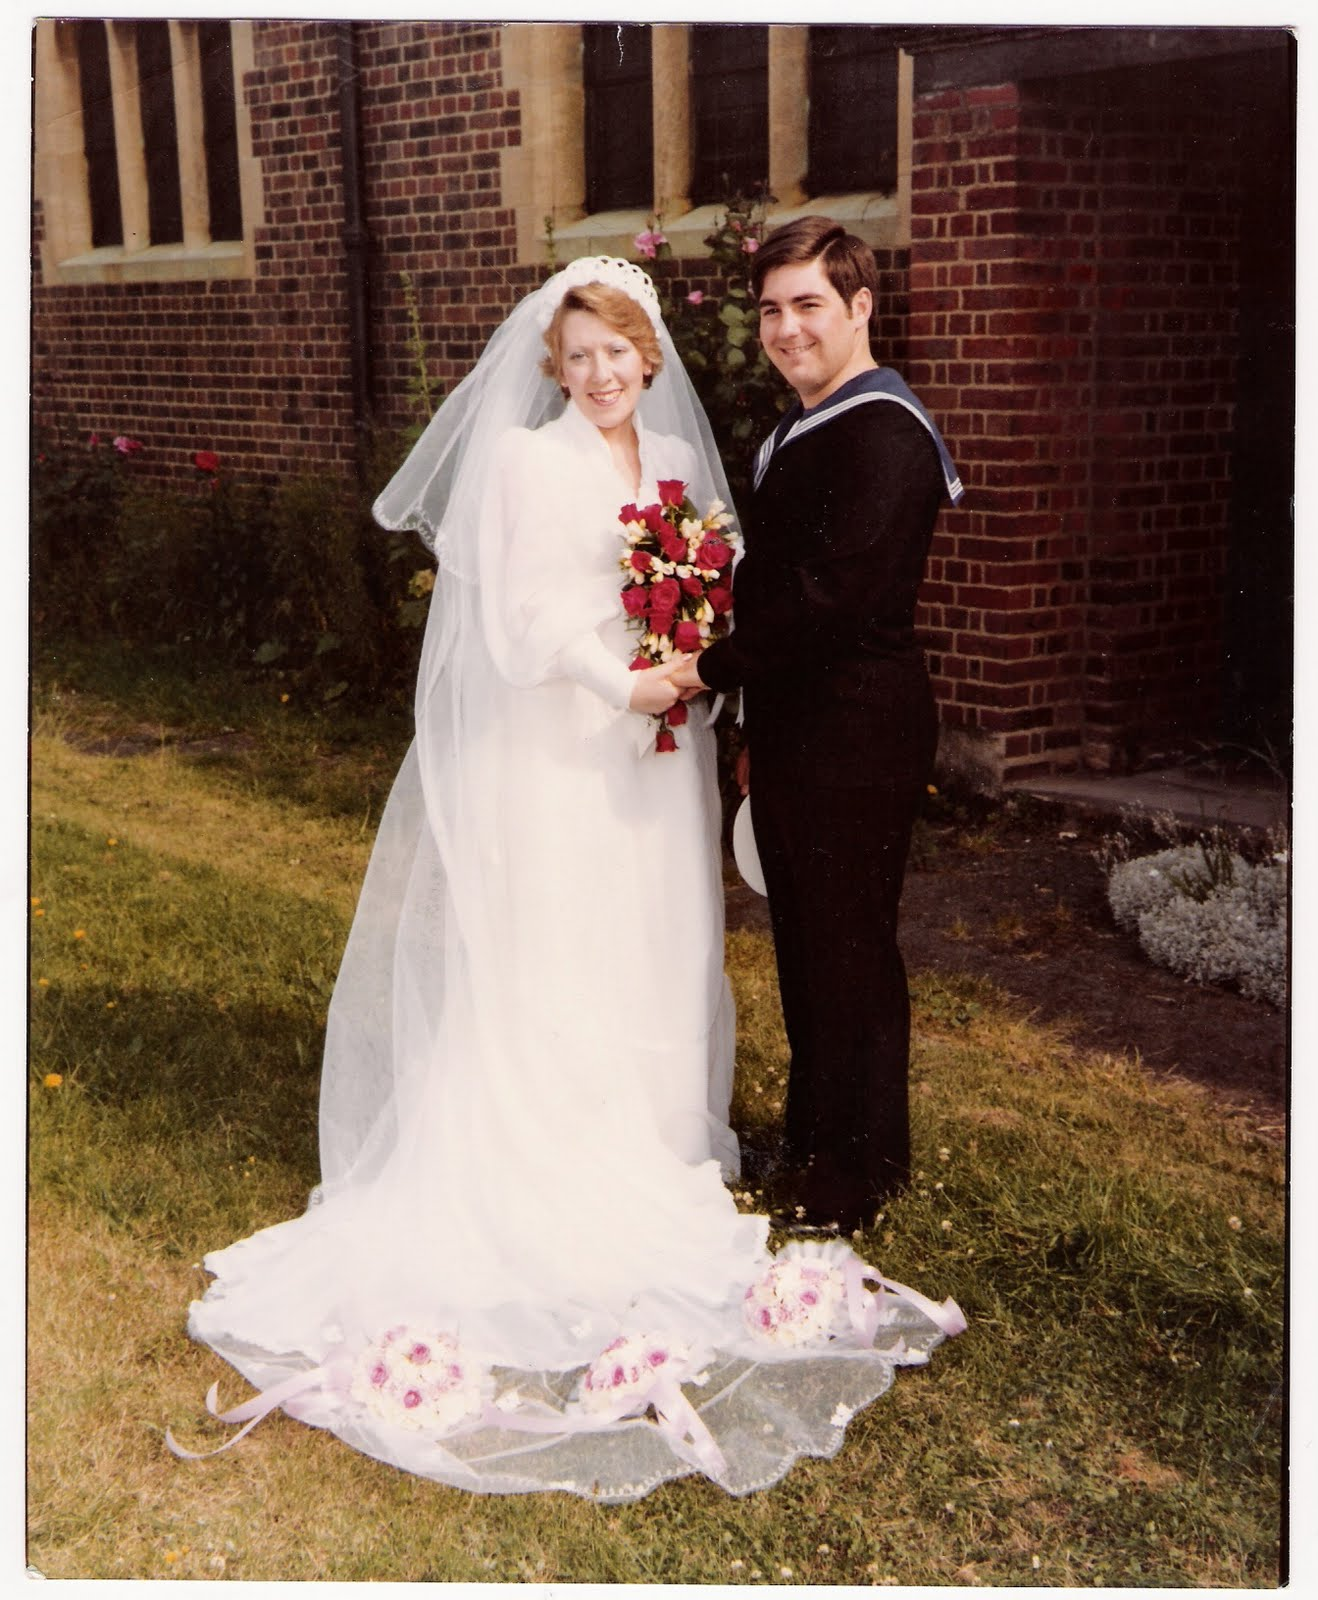 So Happy wedding anniversary